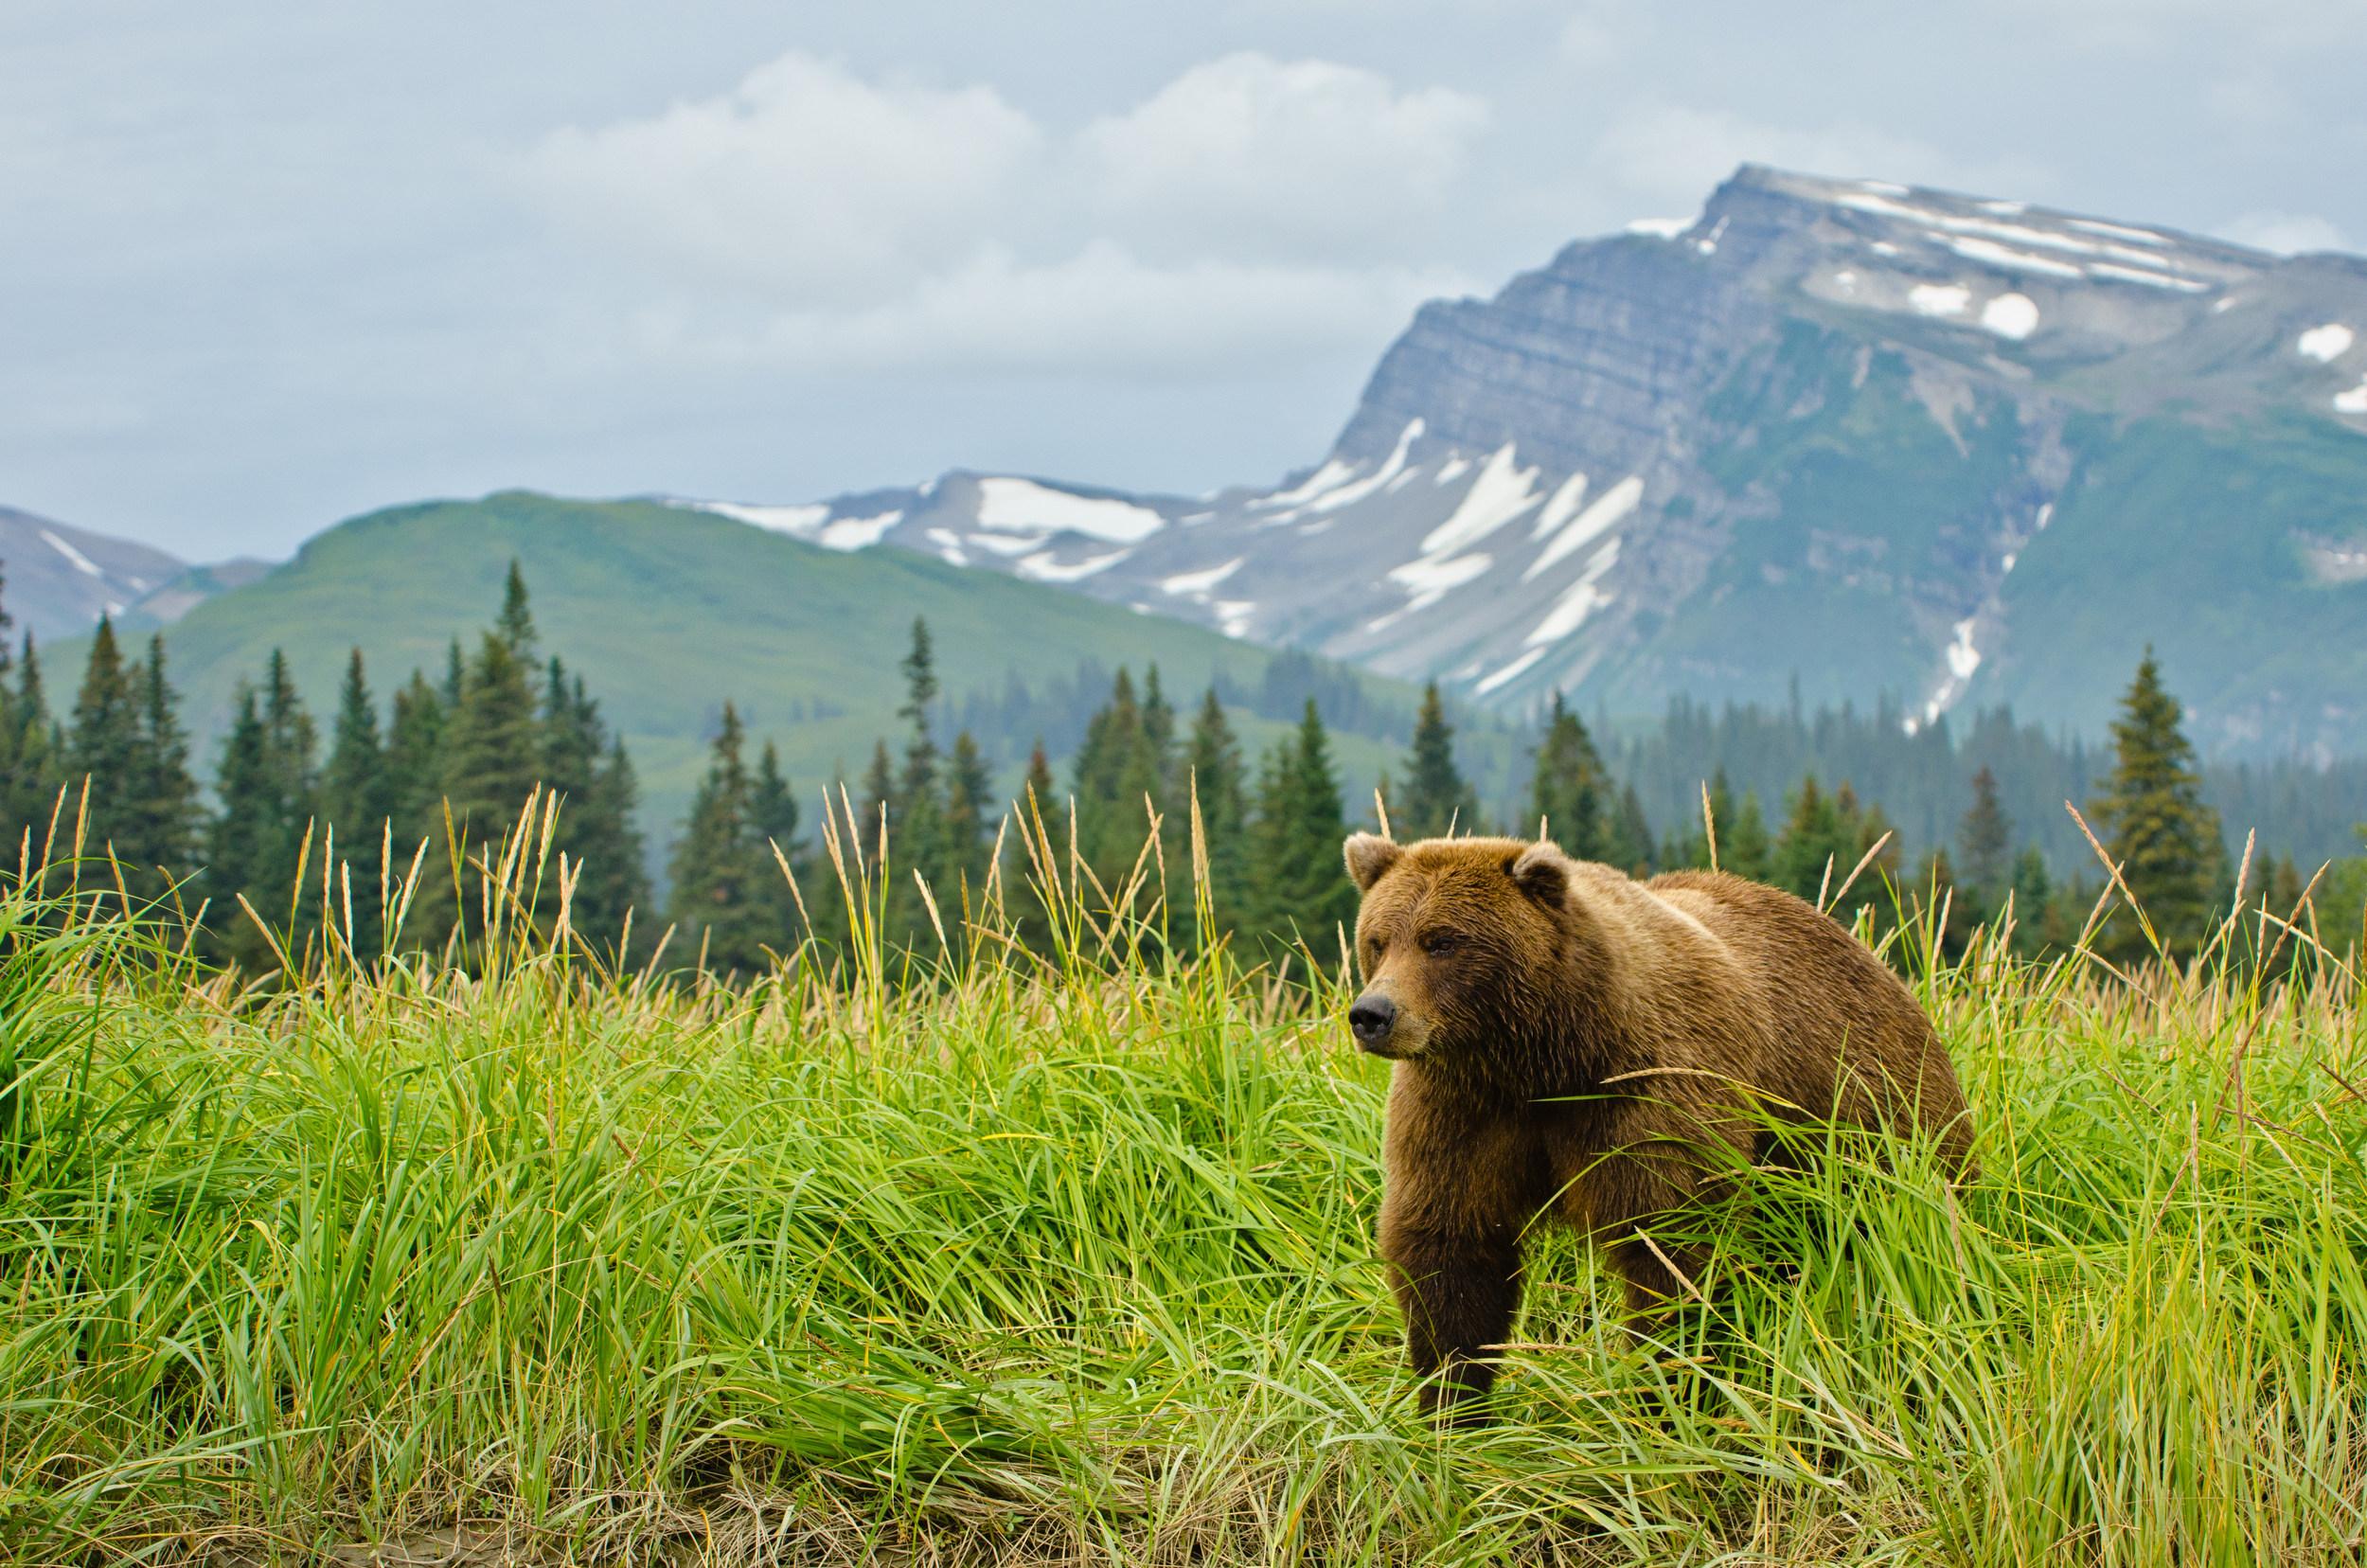 A Coastal Brown Bear In Lake Clark National Park & Preserve –(PHOTO: DAVIDRASMUS/SHUTTERSTOCK)